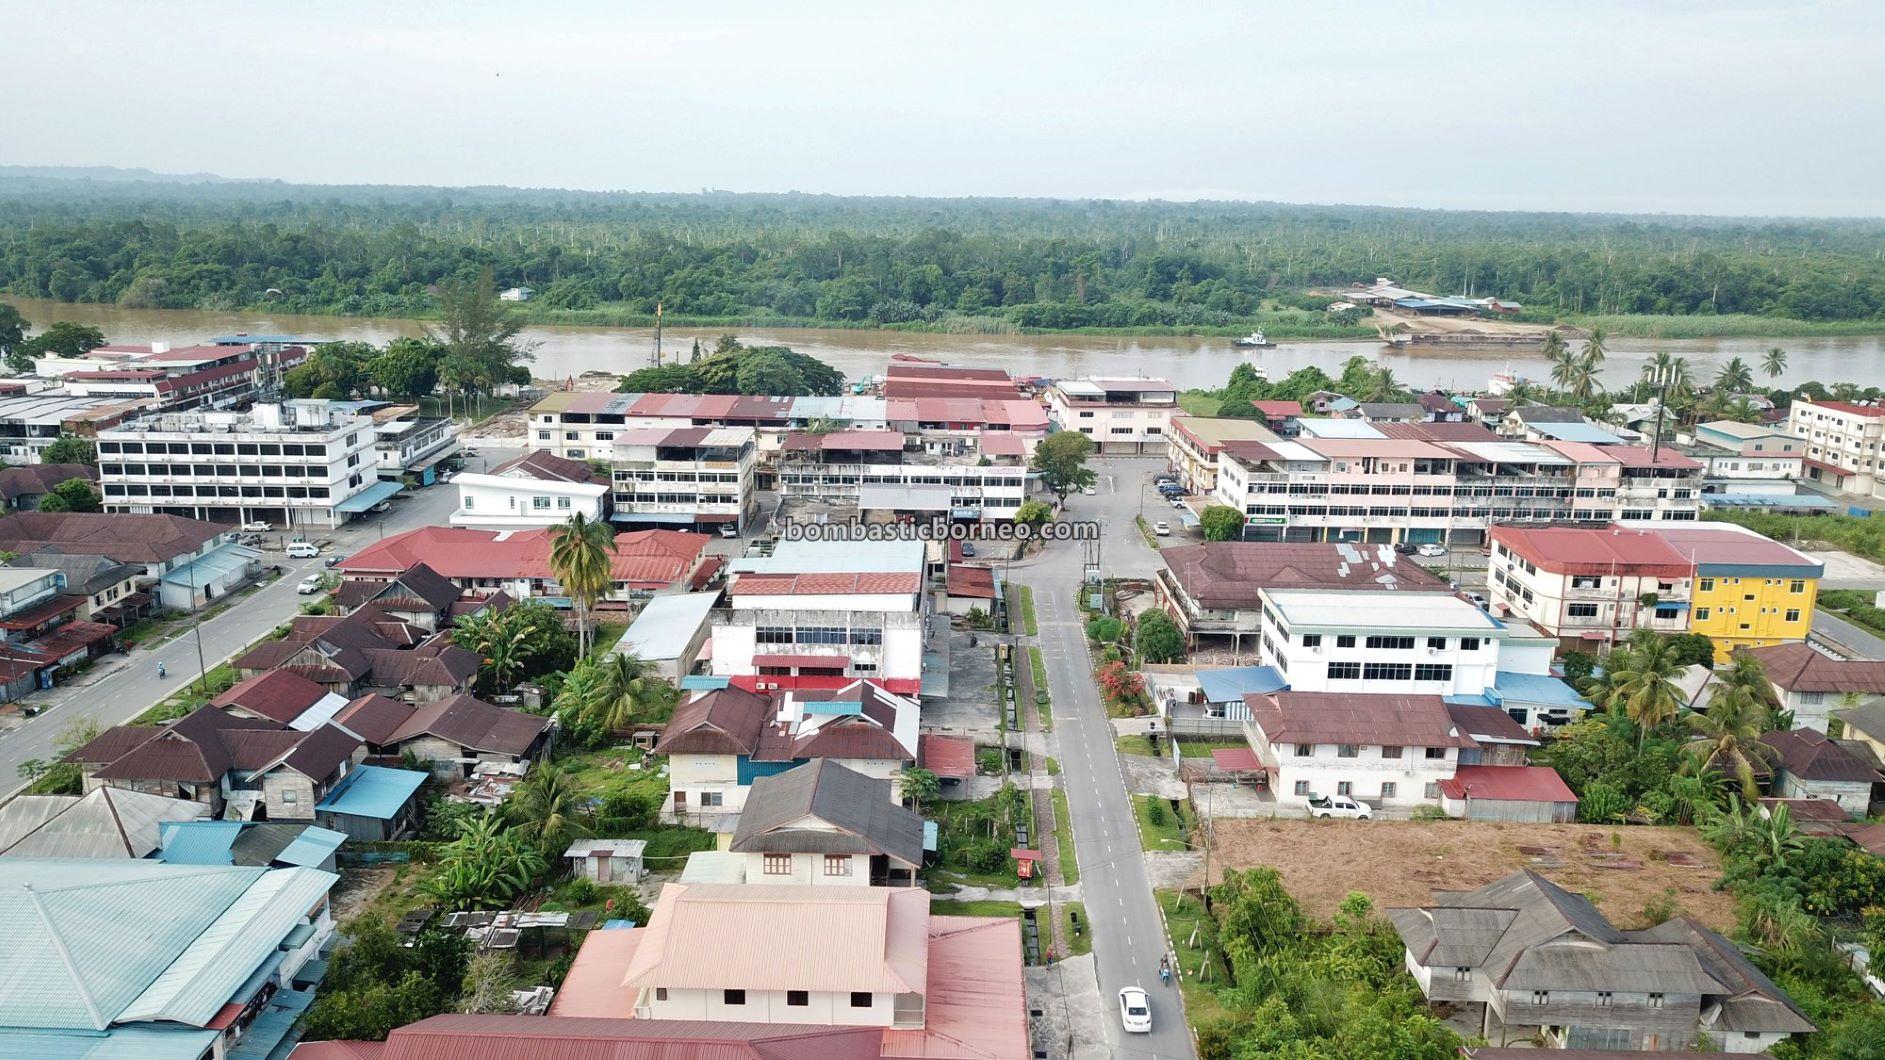 backpackers, Destination, exploration, Fort Hose, museum, Sungai Baram, Baram river, Miri, Marudi, Malaysia, Sarawak, town, Tourism, travel guide, Trans Borneo